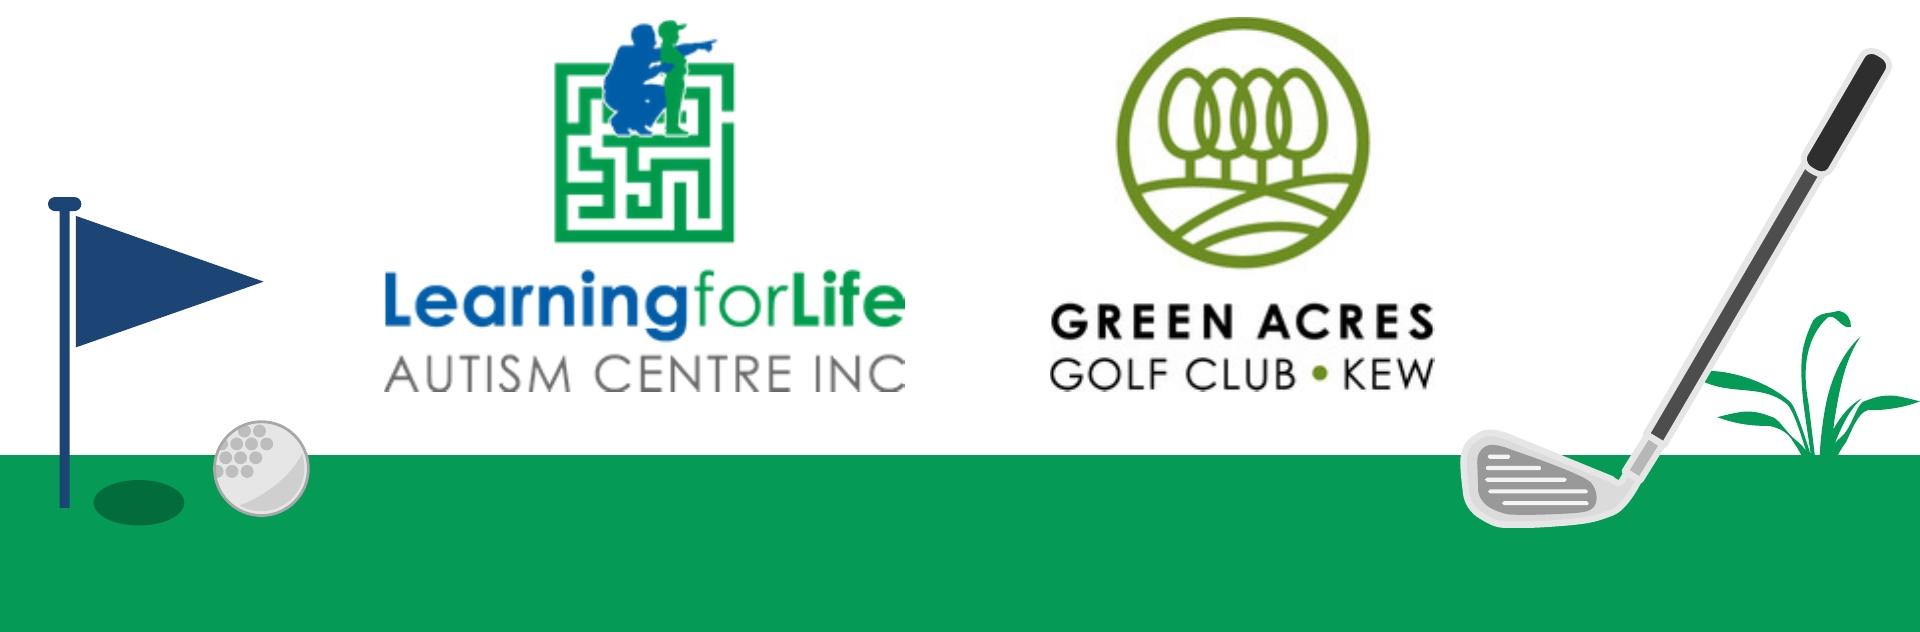 2018 L4Life Golf Day